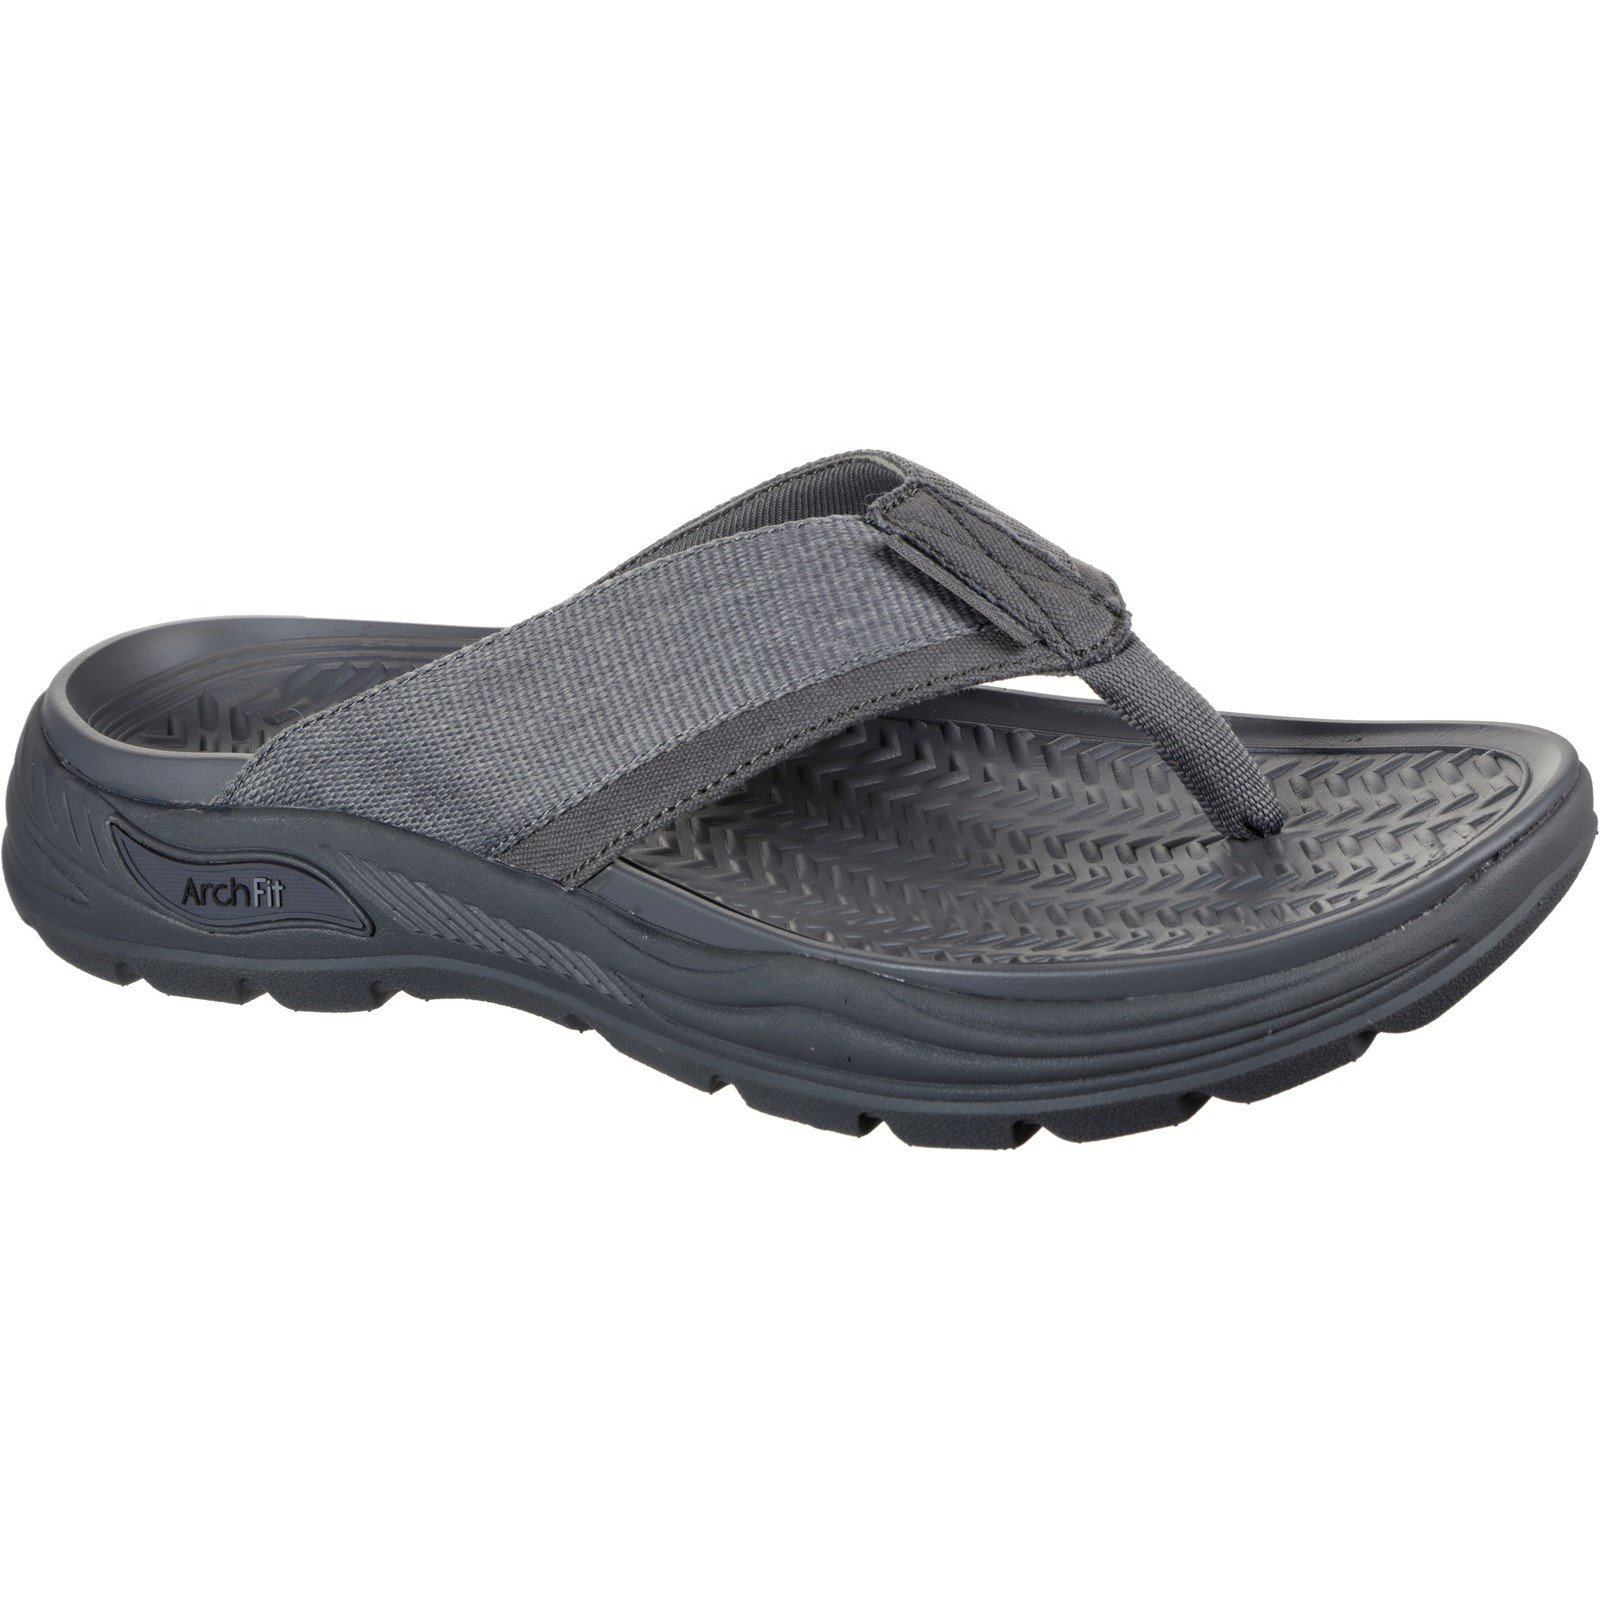 Skechers Men's Arch Fit Motley Dolano Summer Sandal Charcoal 32209 - Charcoal 12